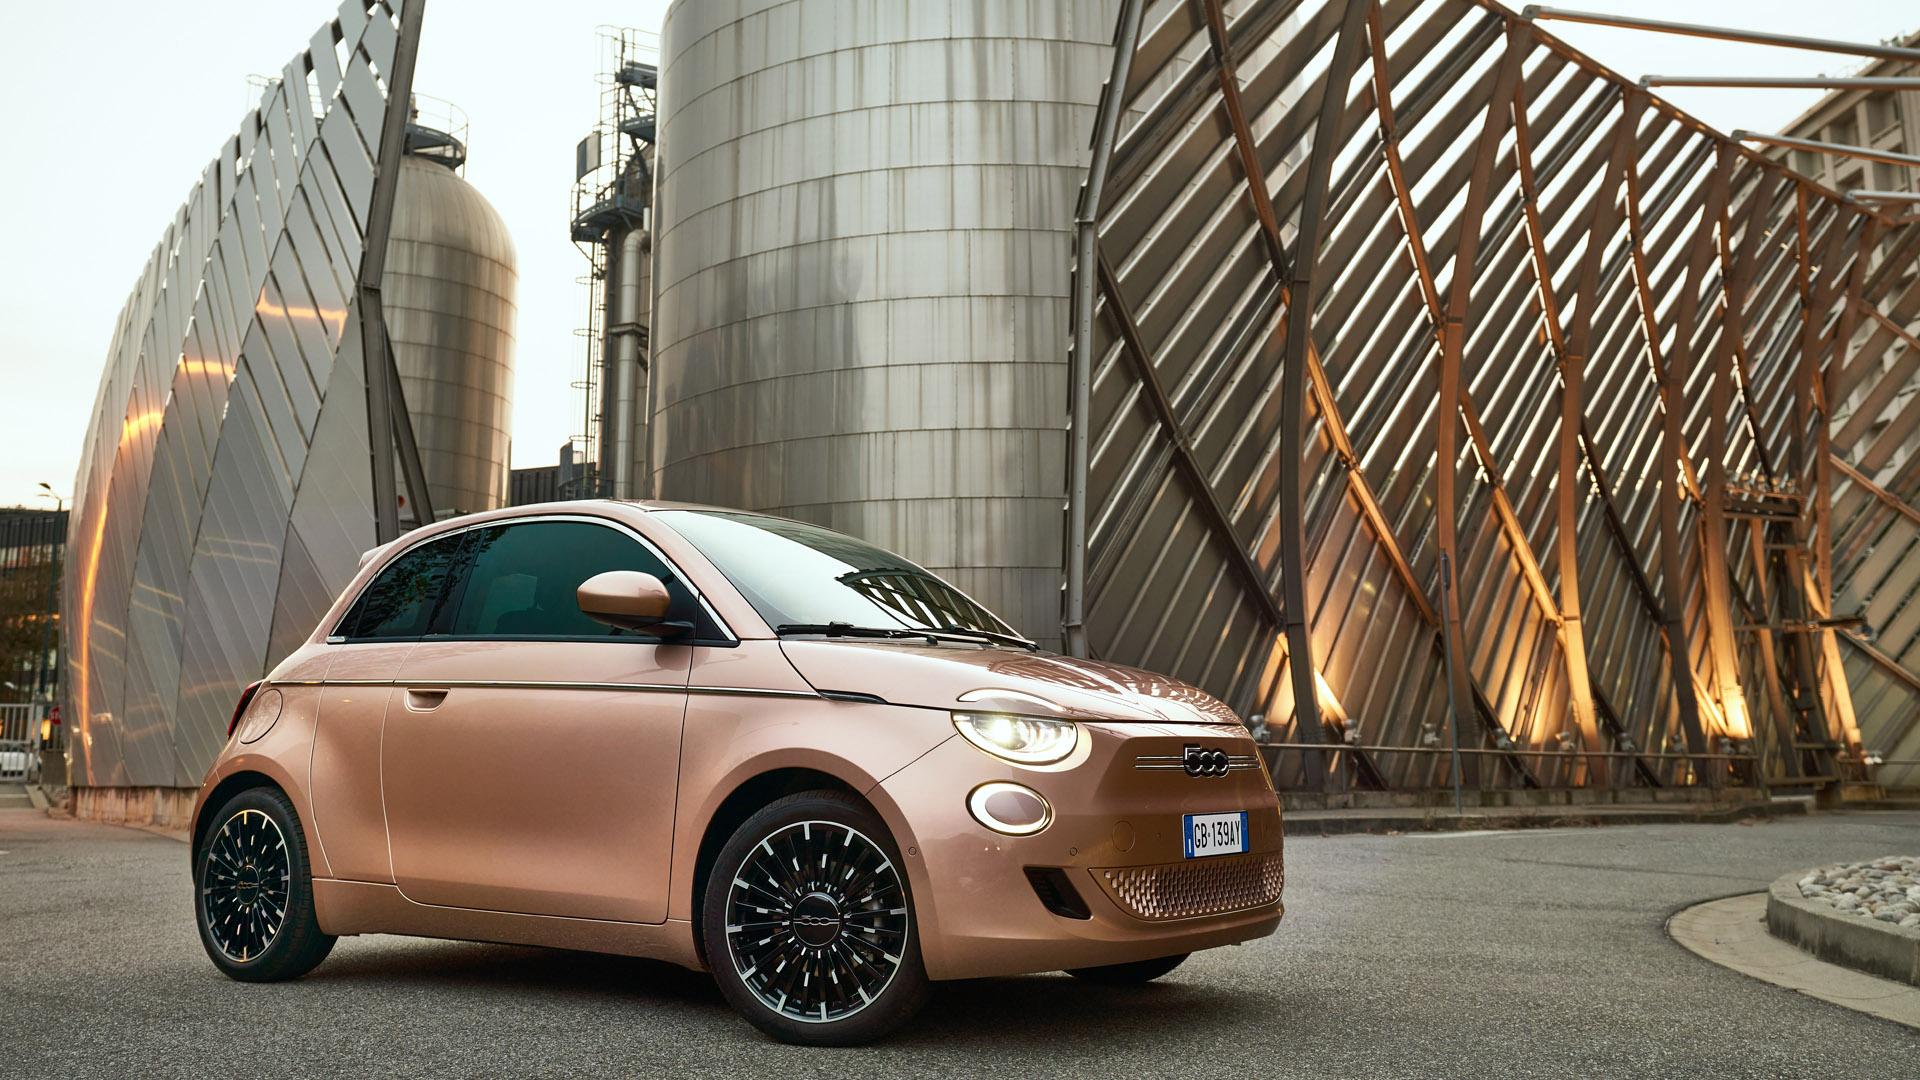 Fiat 500 Electric drive